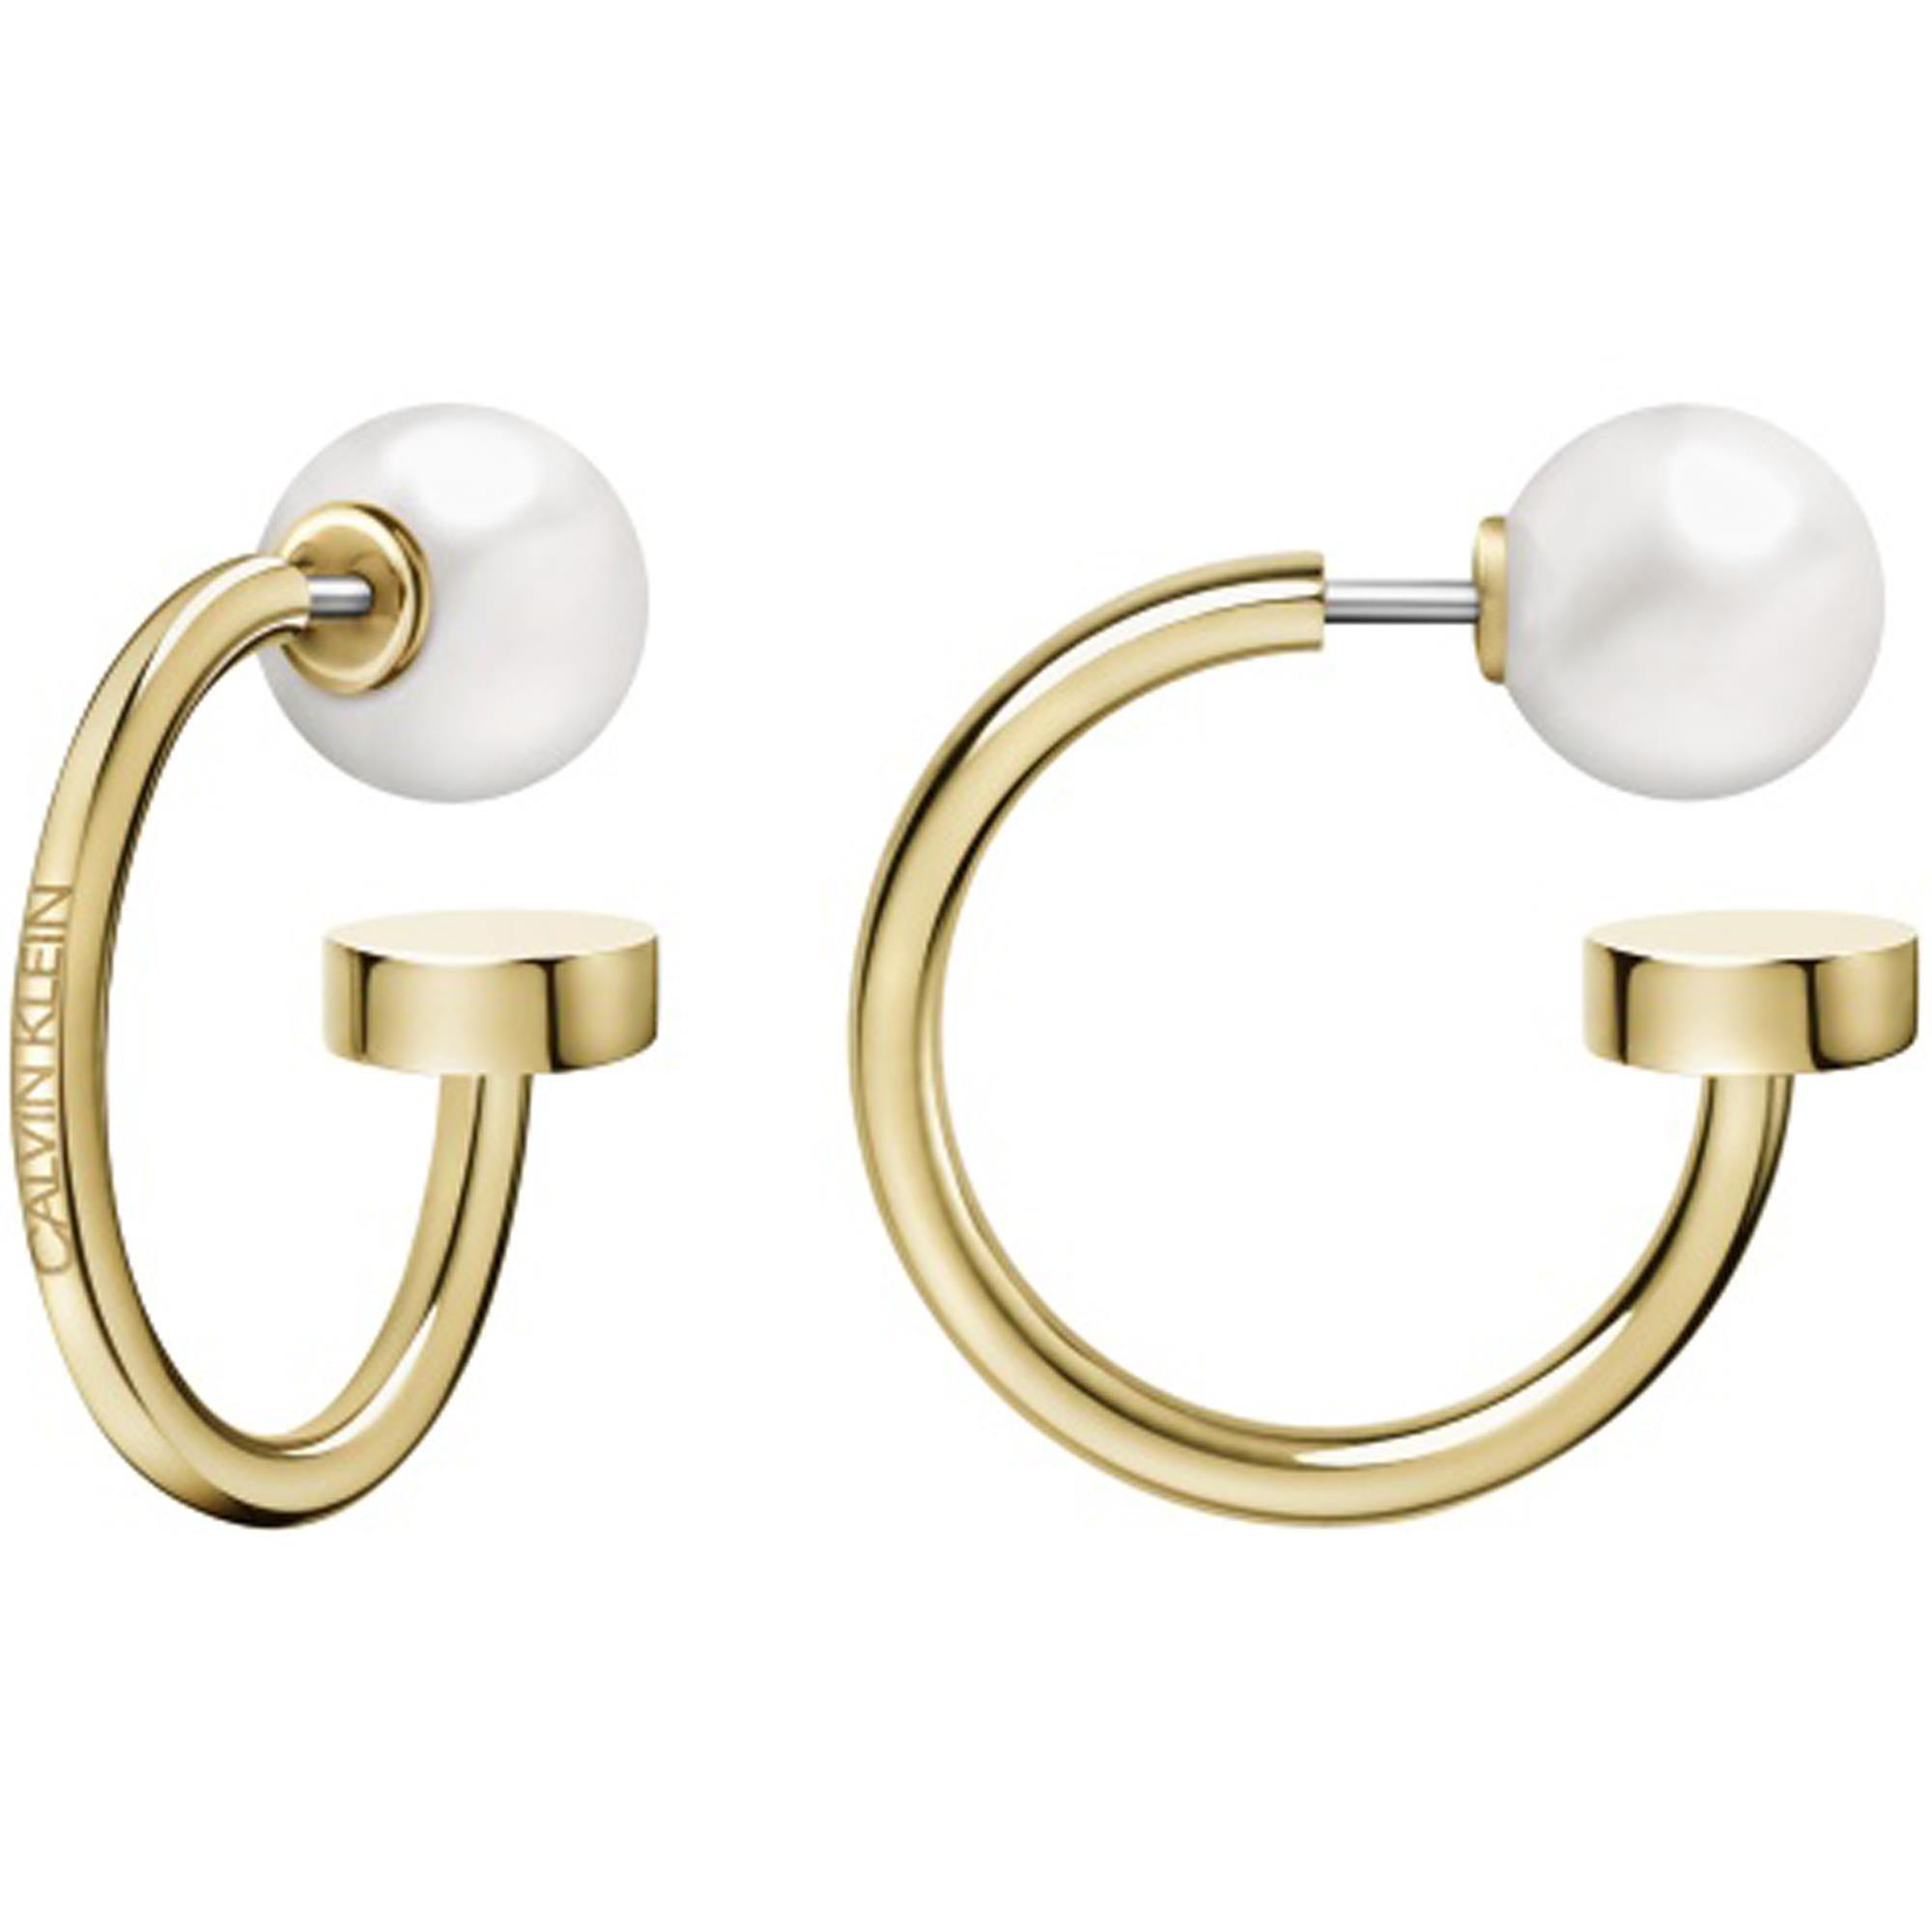 Calvin Klein Bubbly Gold Stainless Steel Earrings KJ9RJE140100